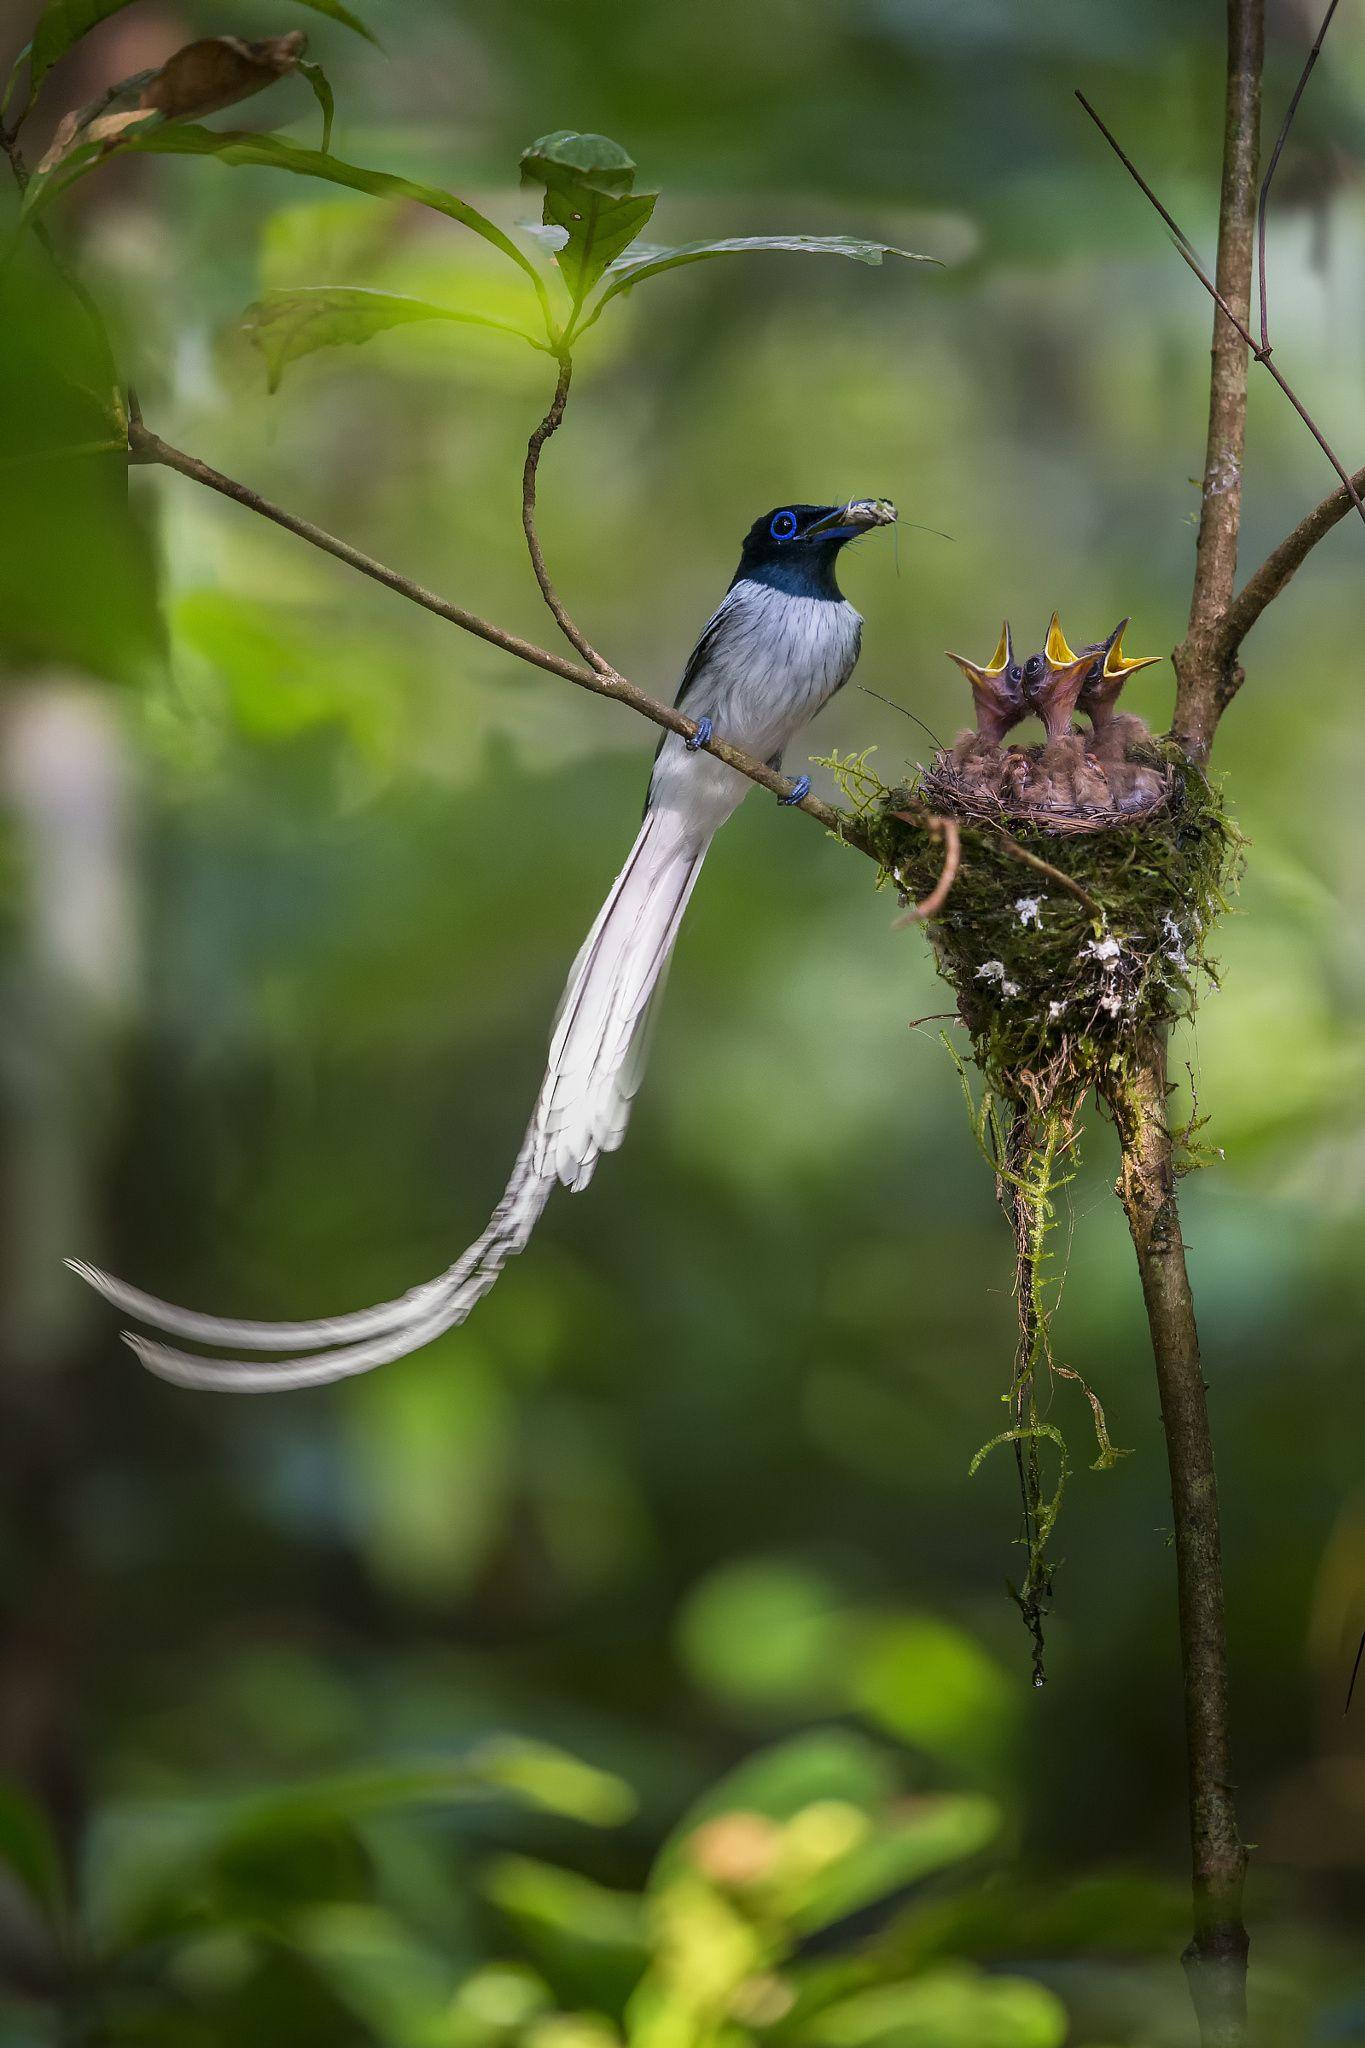 Asian Paradise Flycatcher is a mediumsized passerine